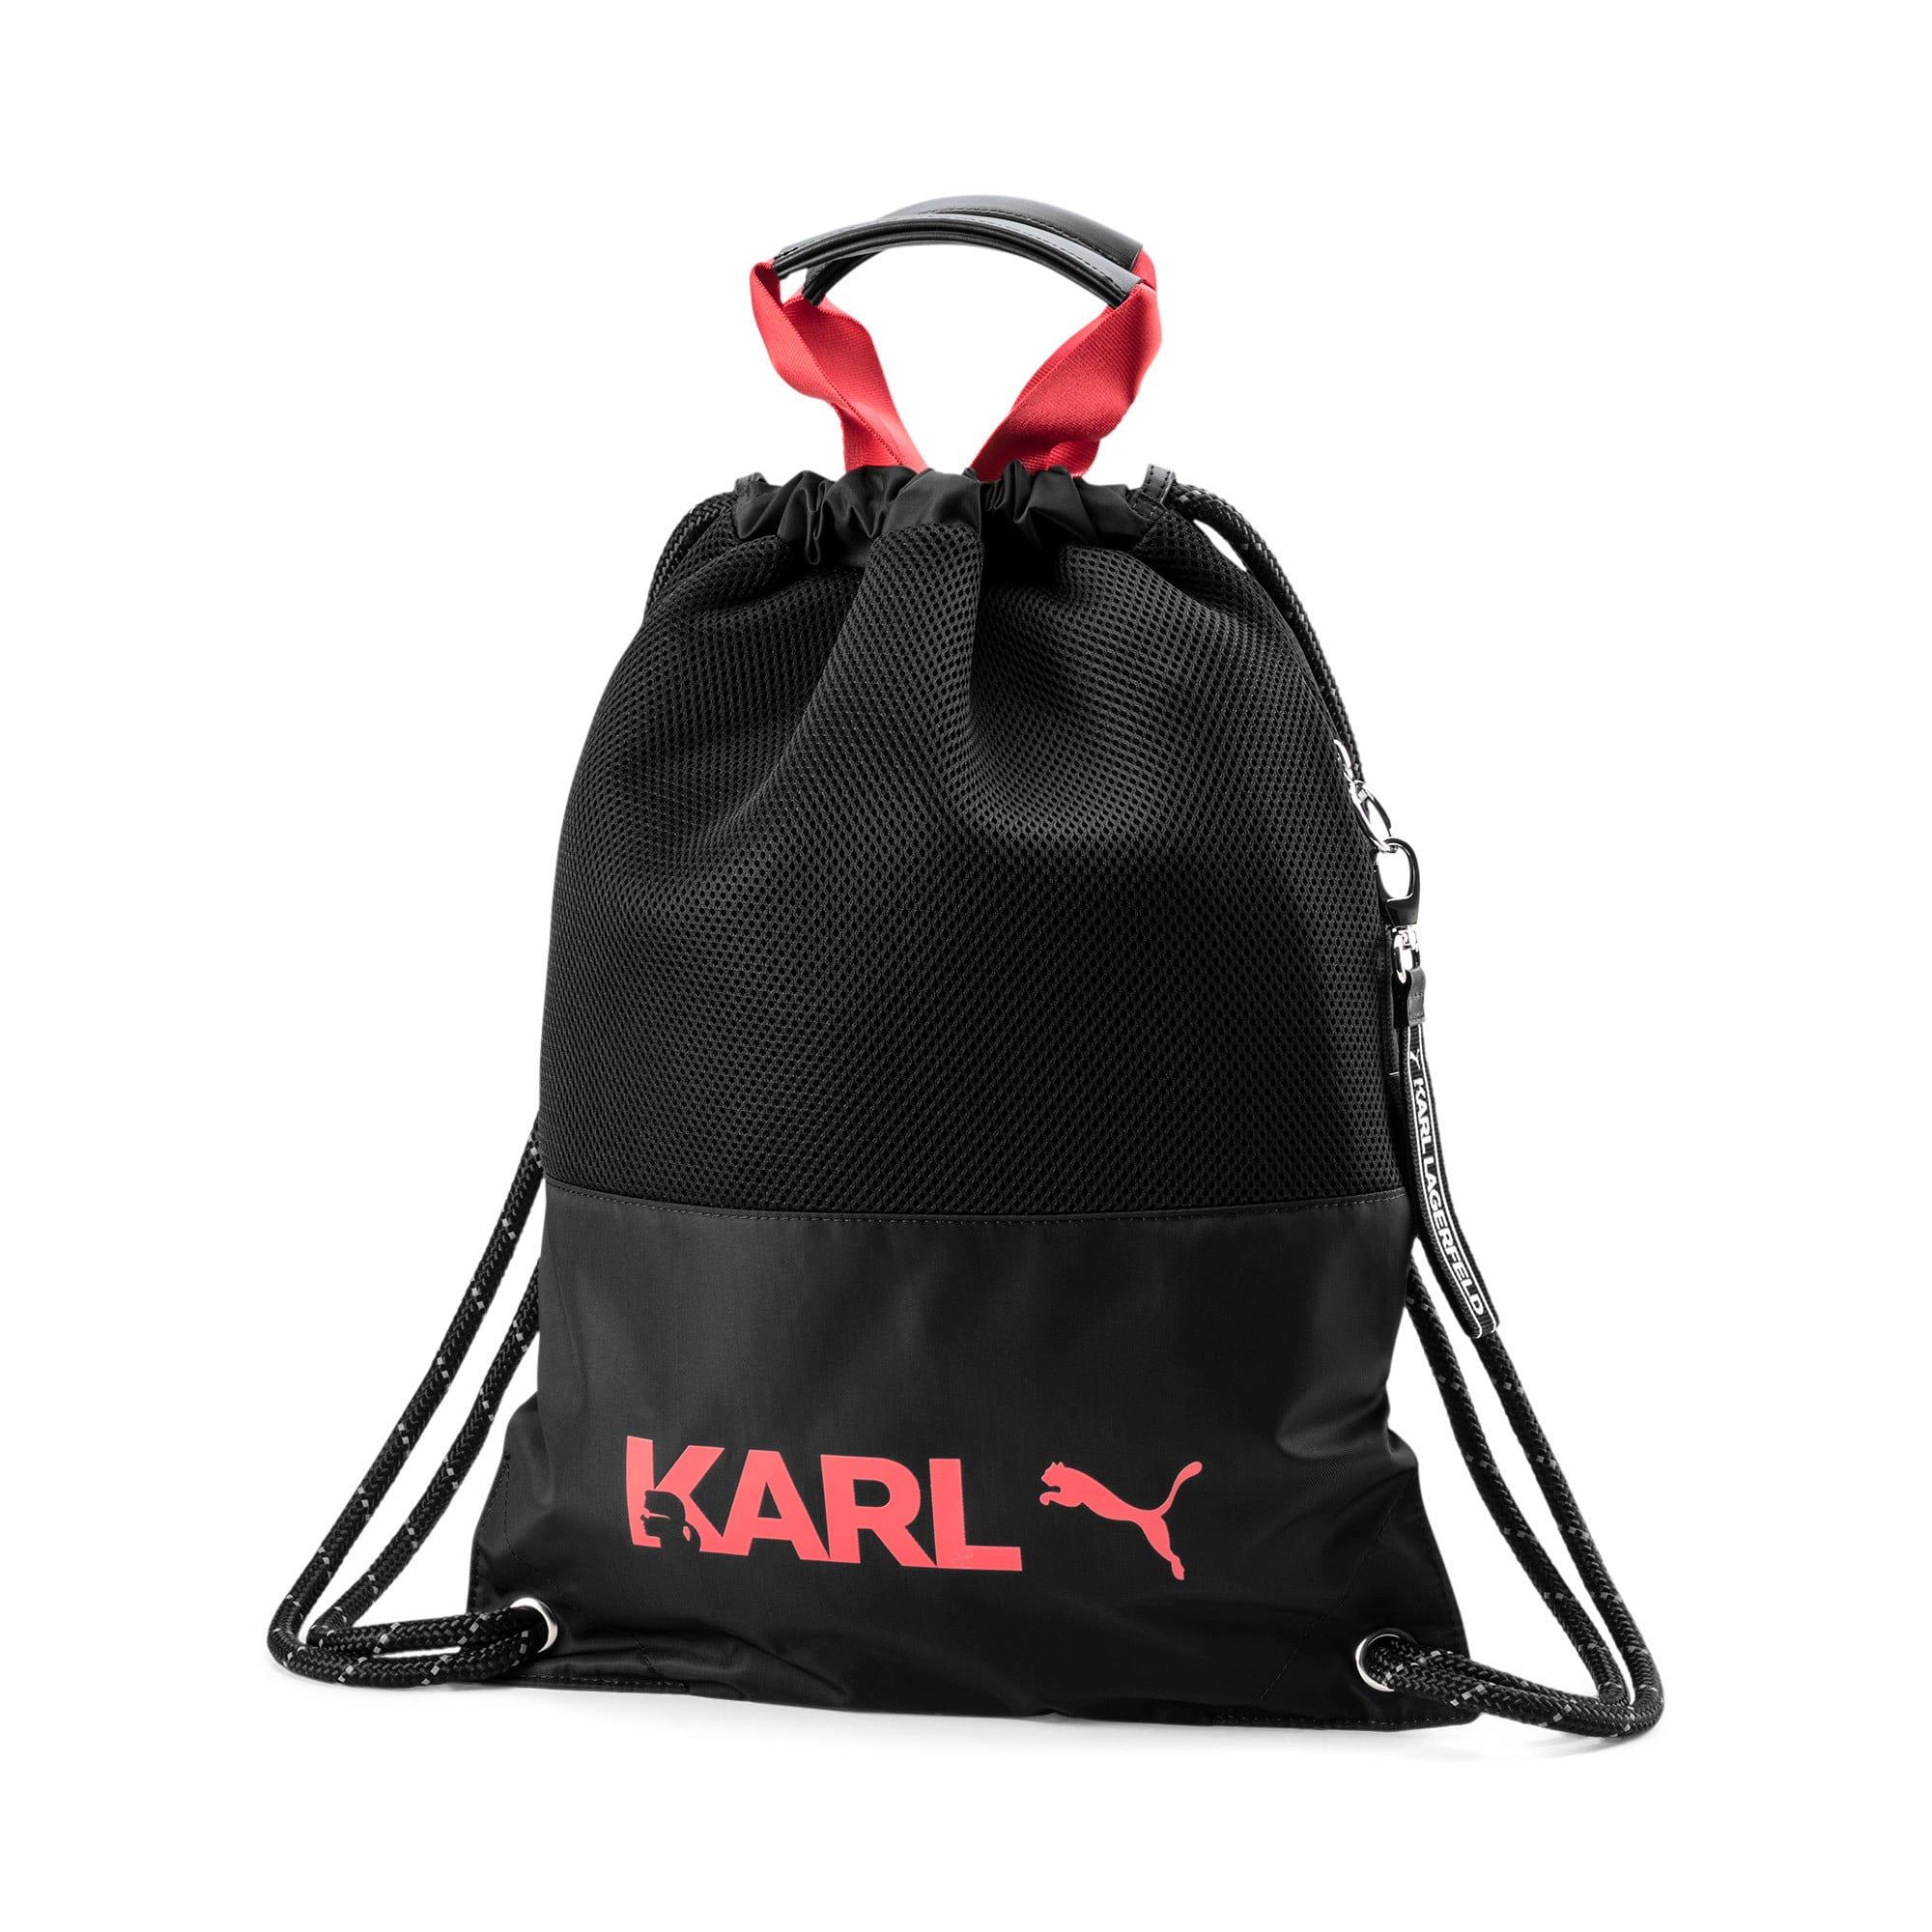 Thumbnail 1 of PUMA x KARL LAGERFELD Backpack Tote, Puma Black, medium